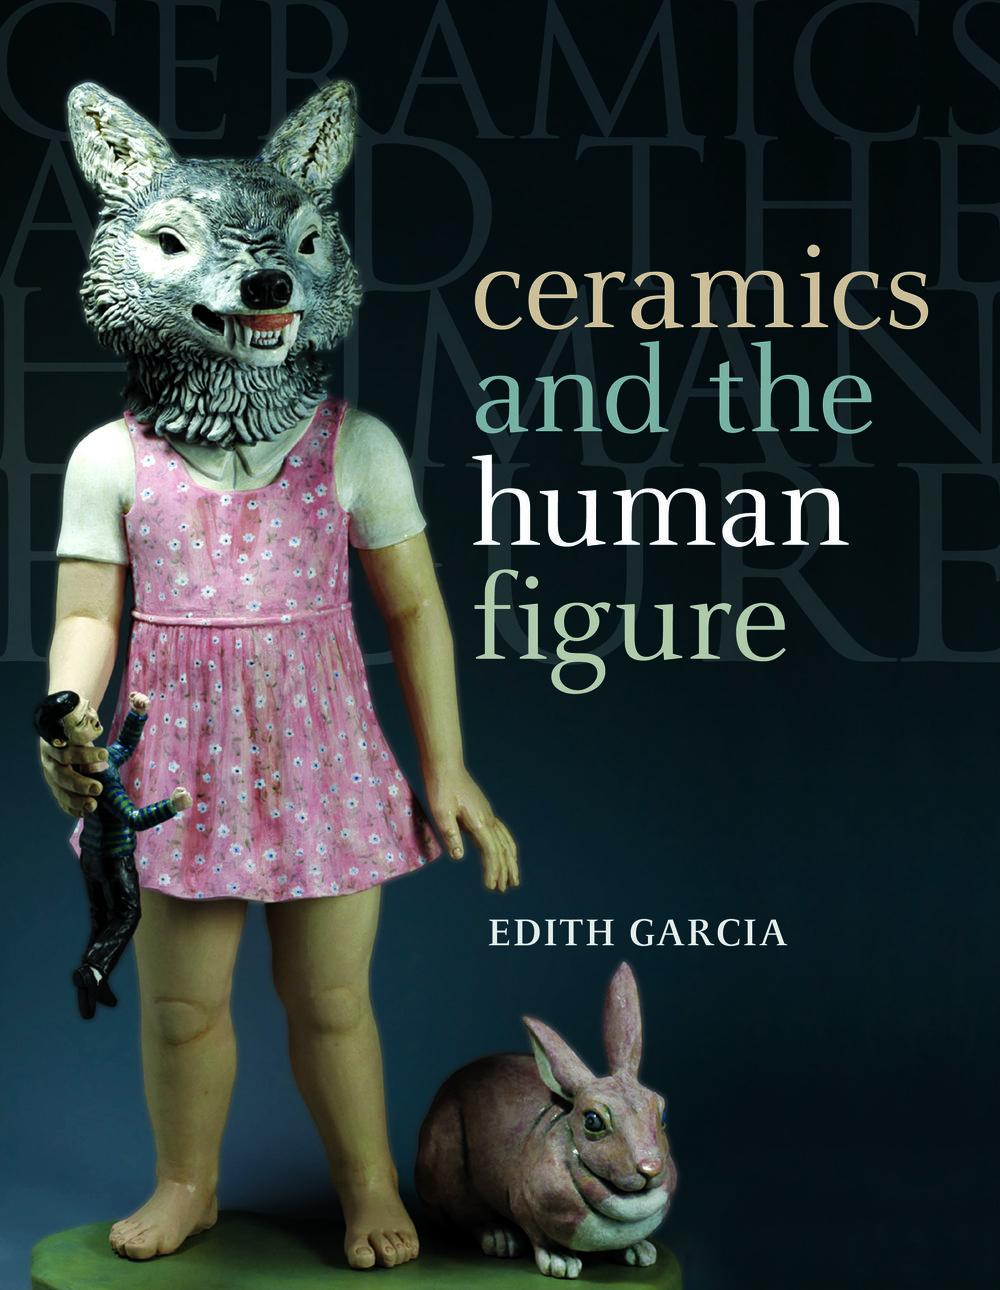 Edith_Garcia_10_72DPI_Ceramics_Human_Cover.jpg